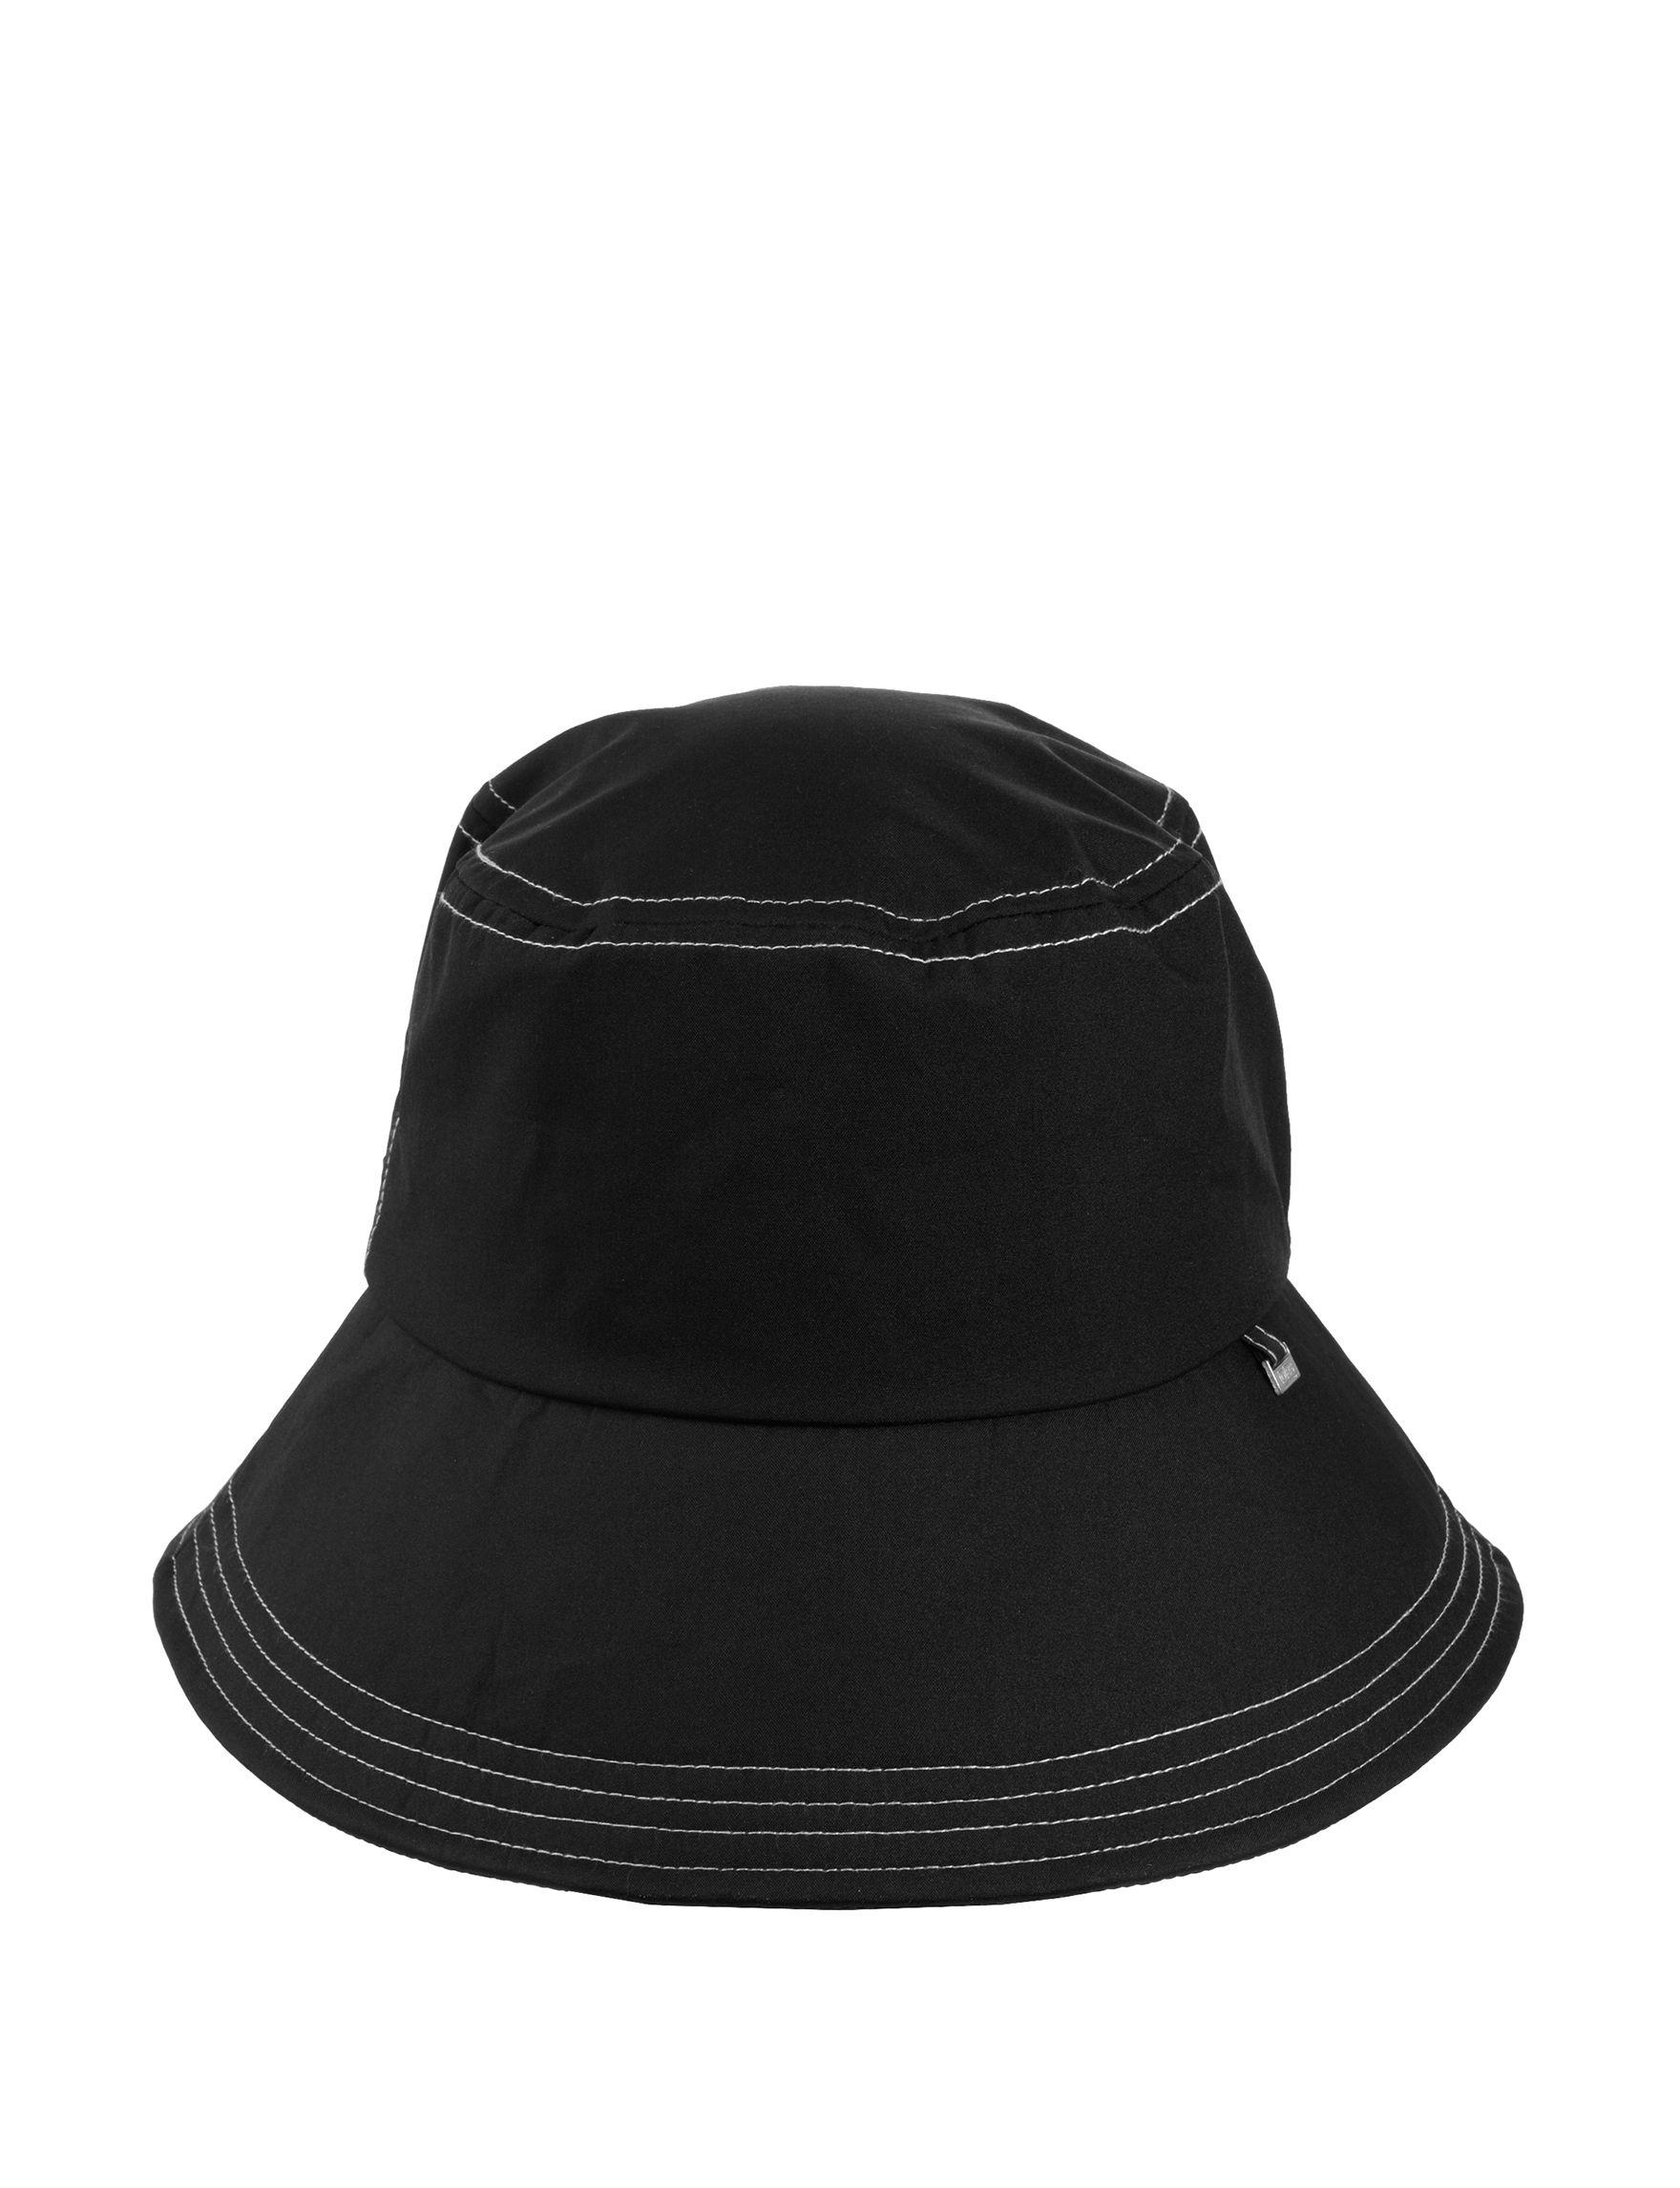 Isotoner Black Hats & Headwear